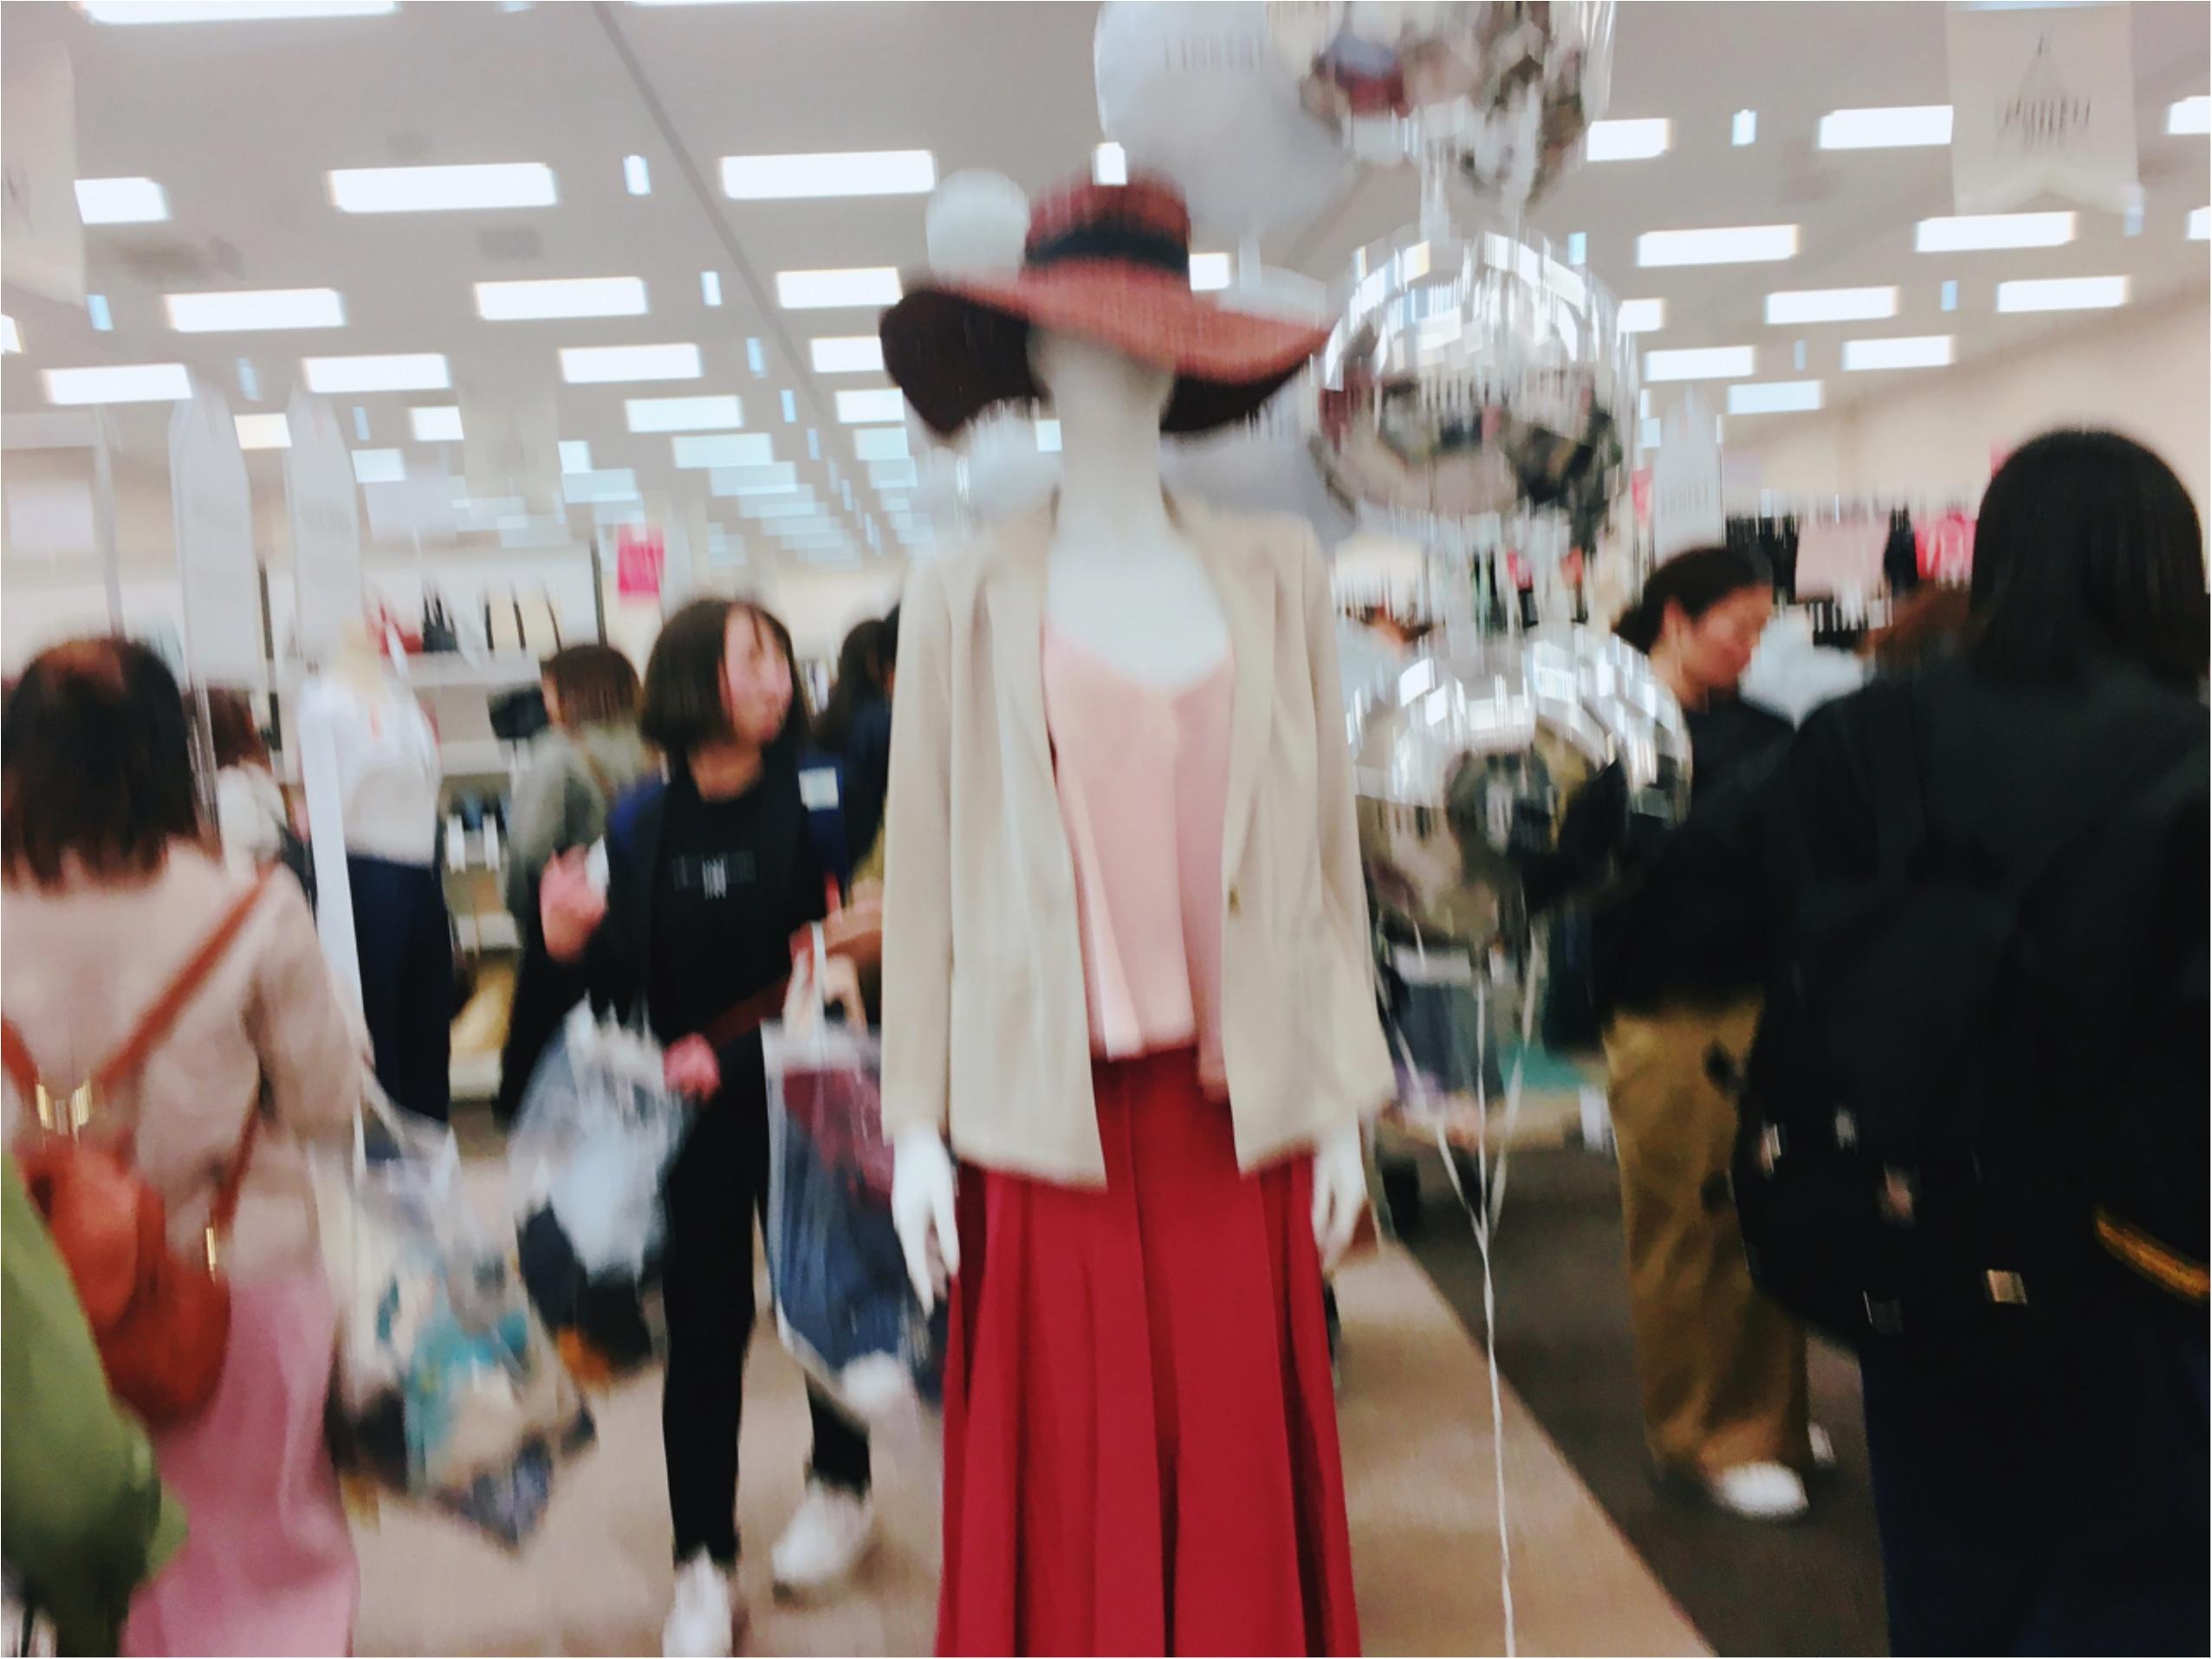 【TOKYO OUTLET WEEK】週末はファッションアウトレットイベントへ!お買い得すぎる戦利品公開♡_3